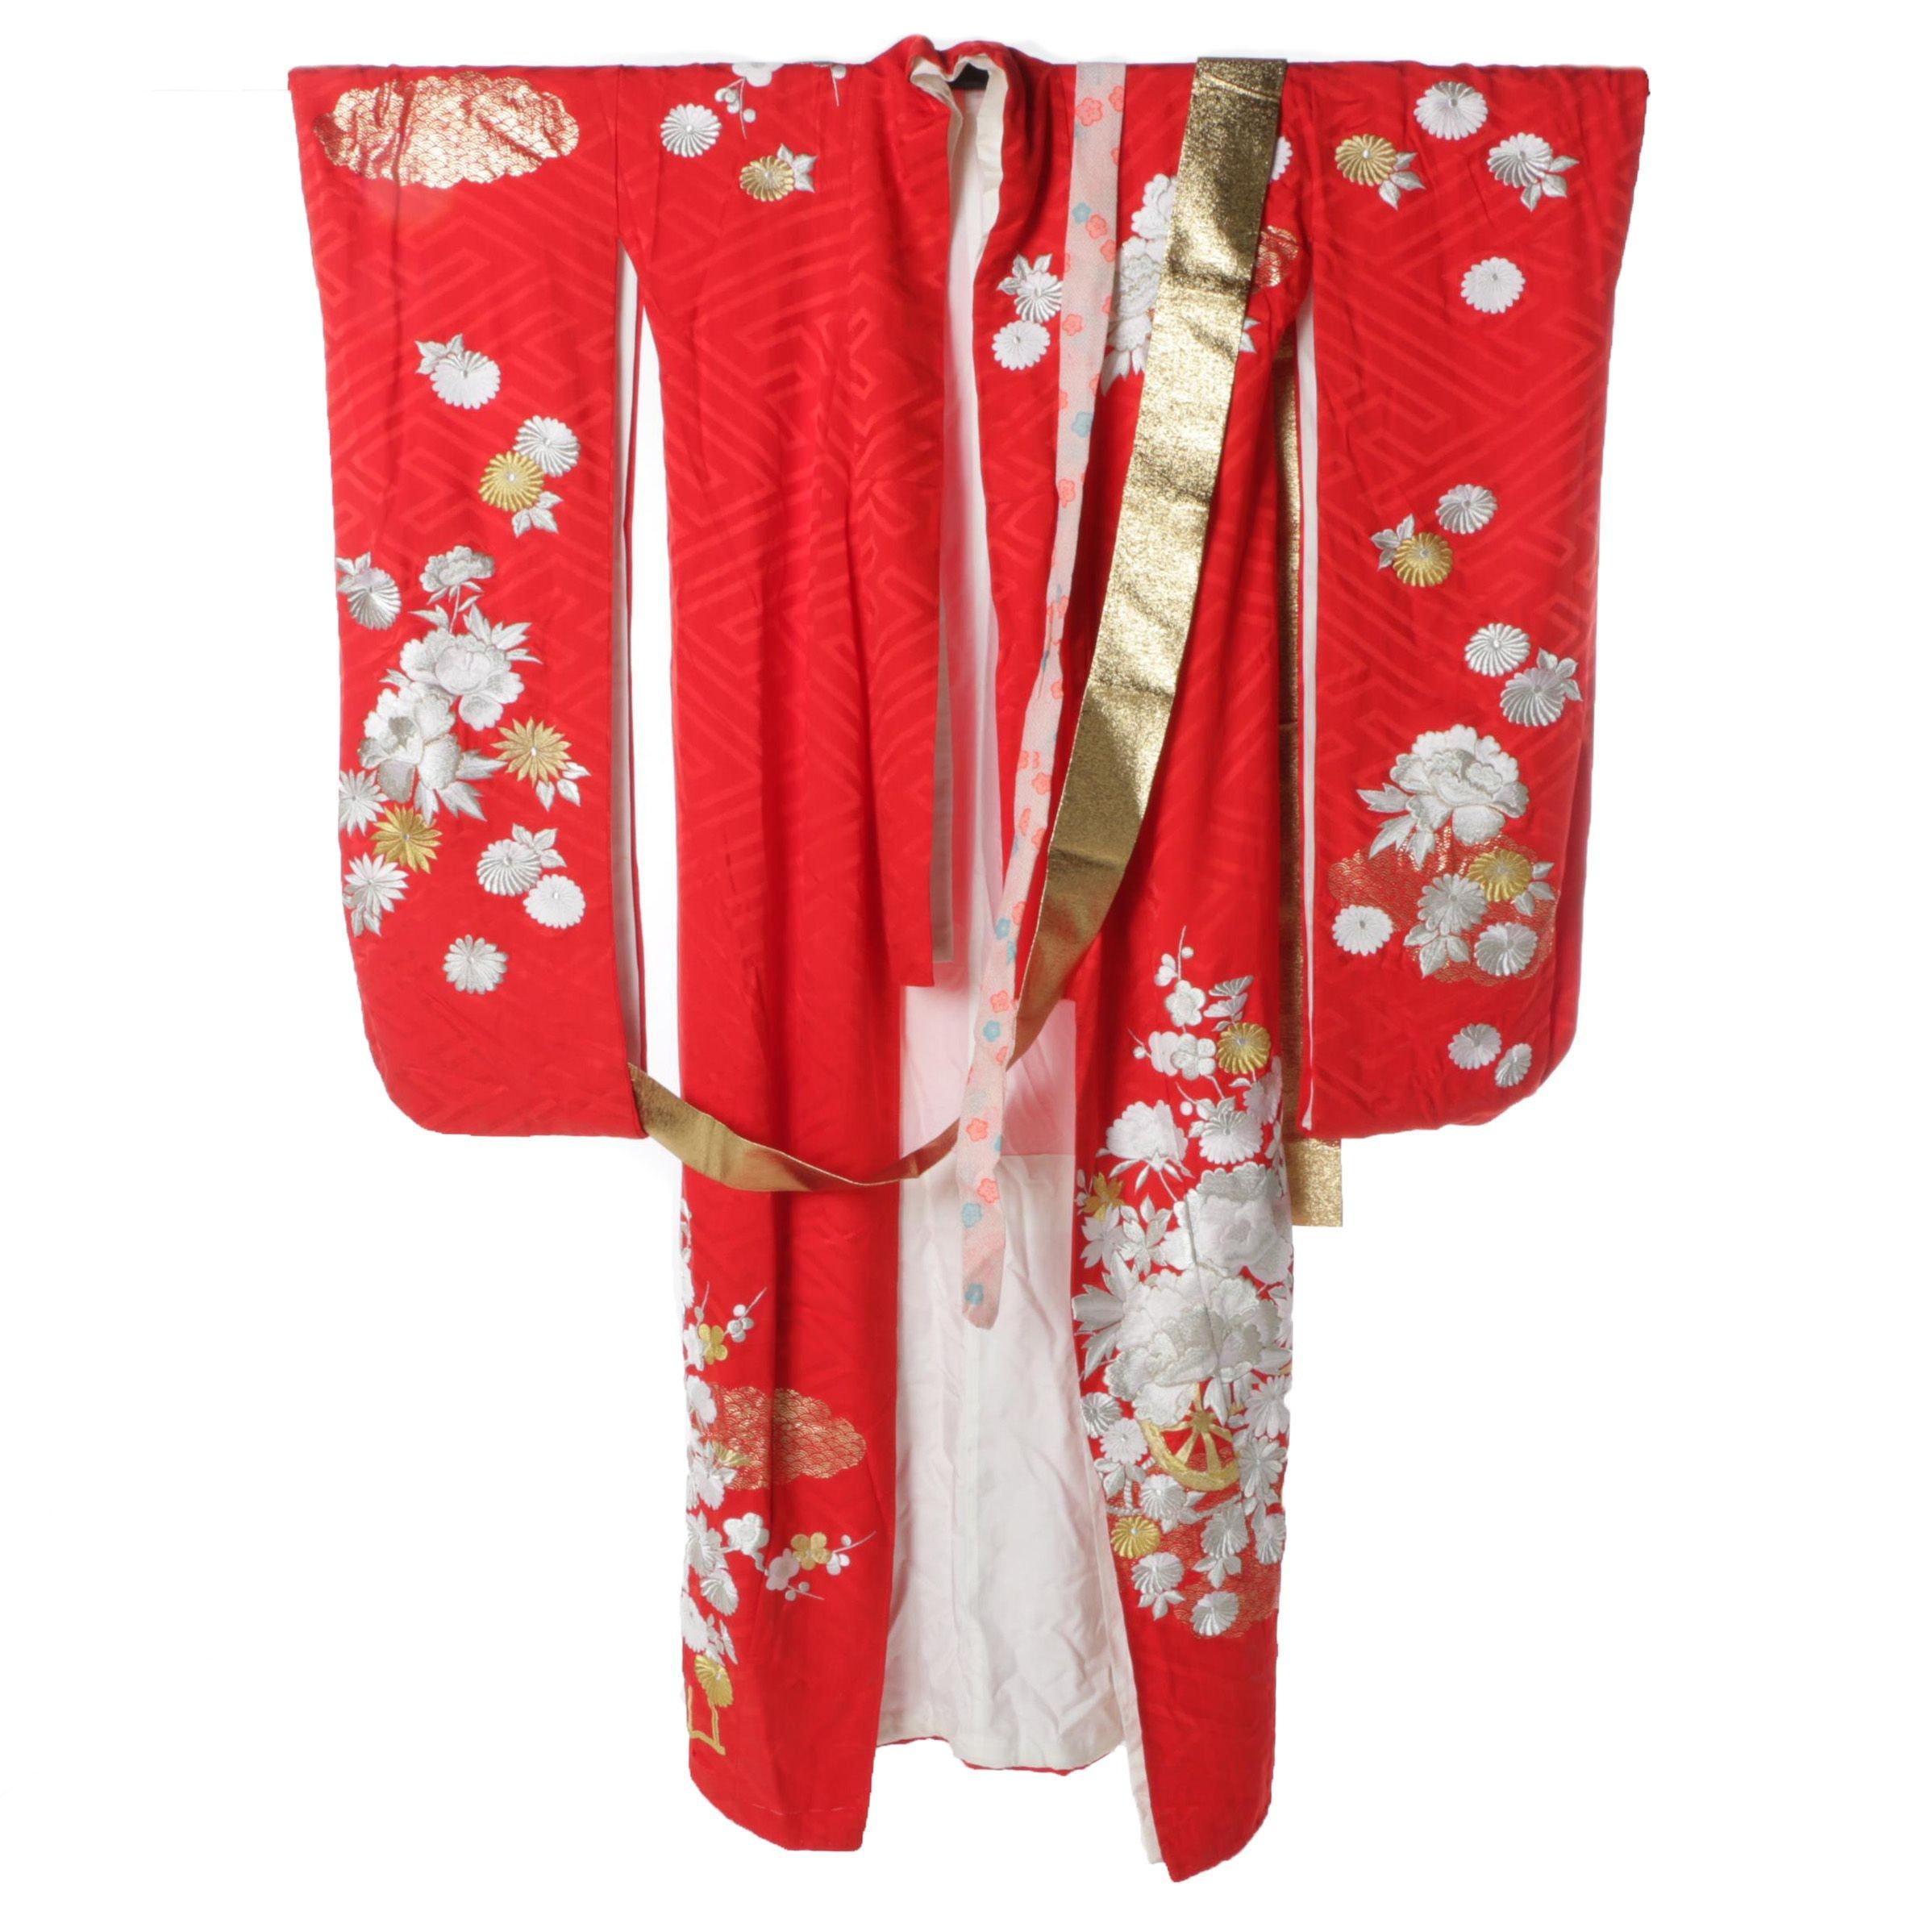 Women's Japanese Embroidered Silk Uchikake Wedding Kimono with Obi